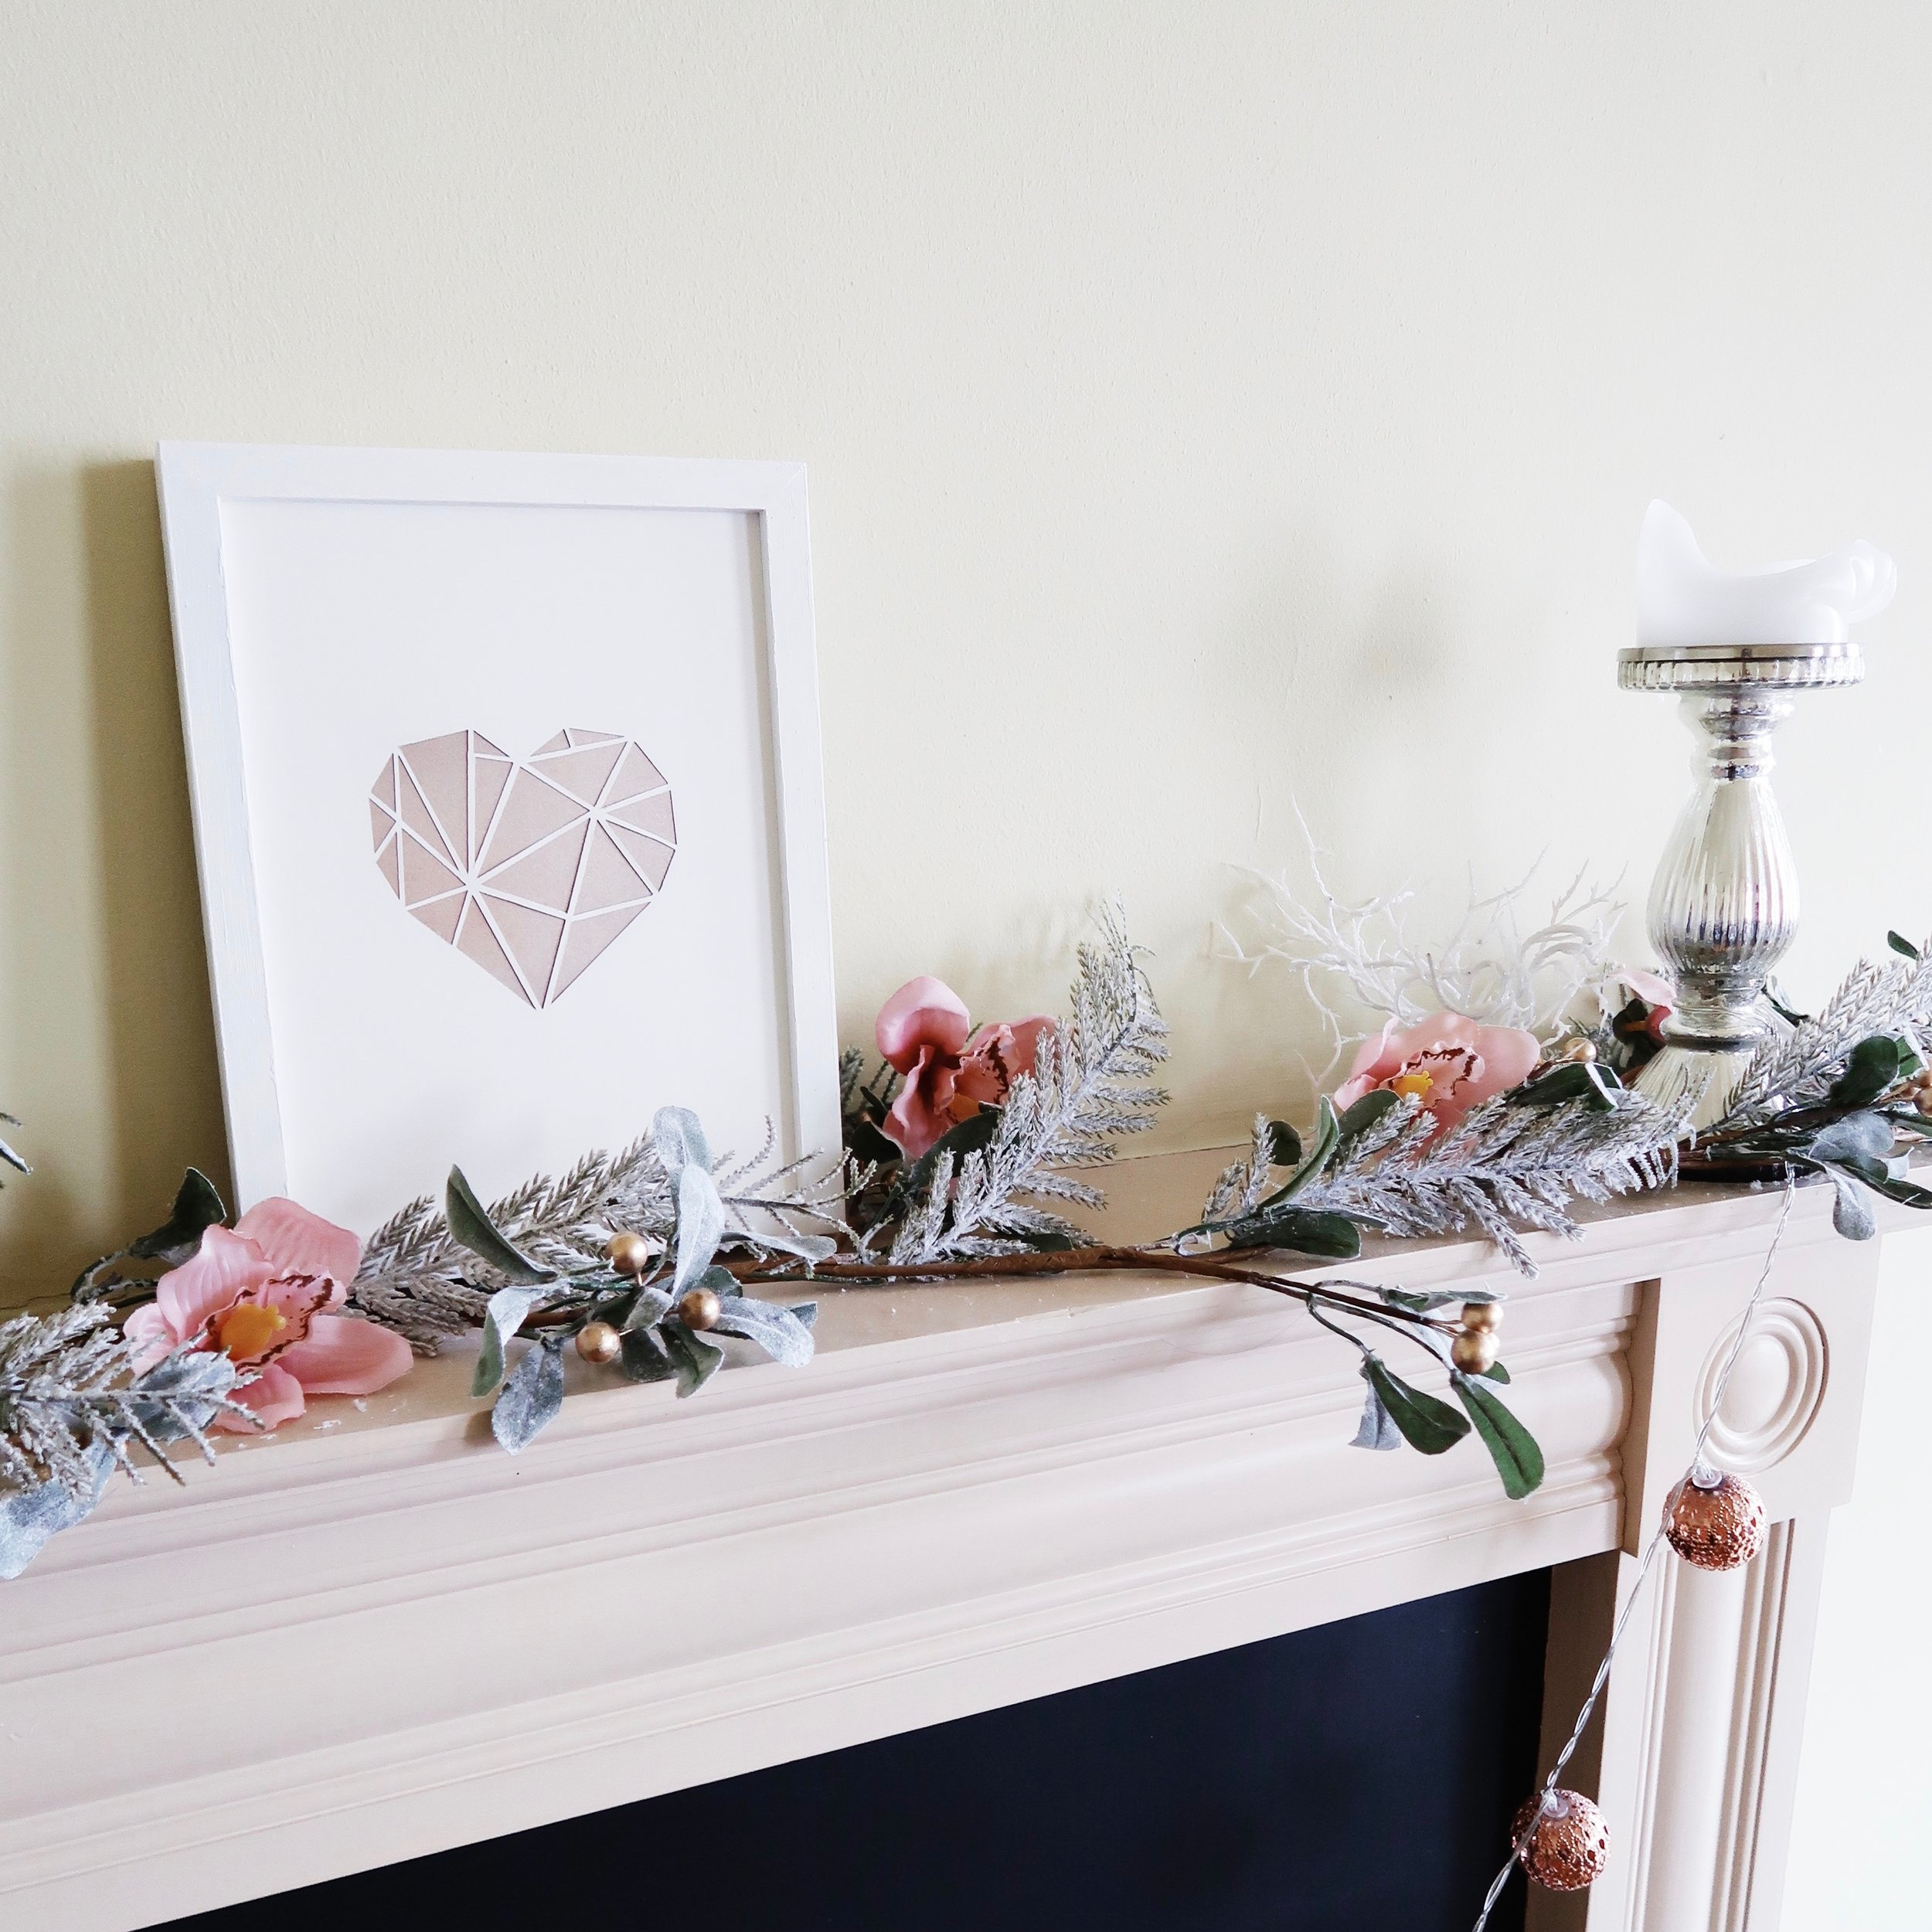 3. - DIY Paper-cut Heart Wall Art